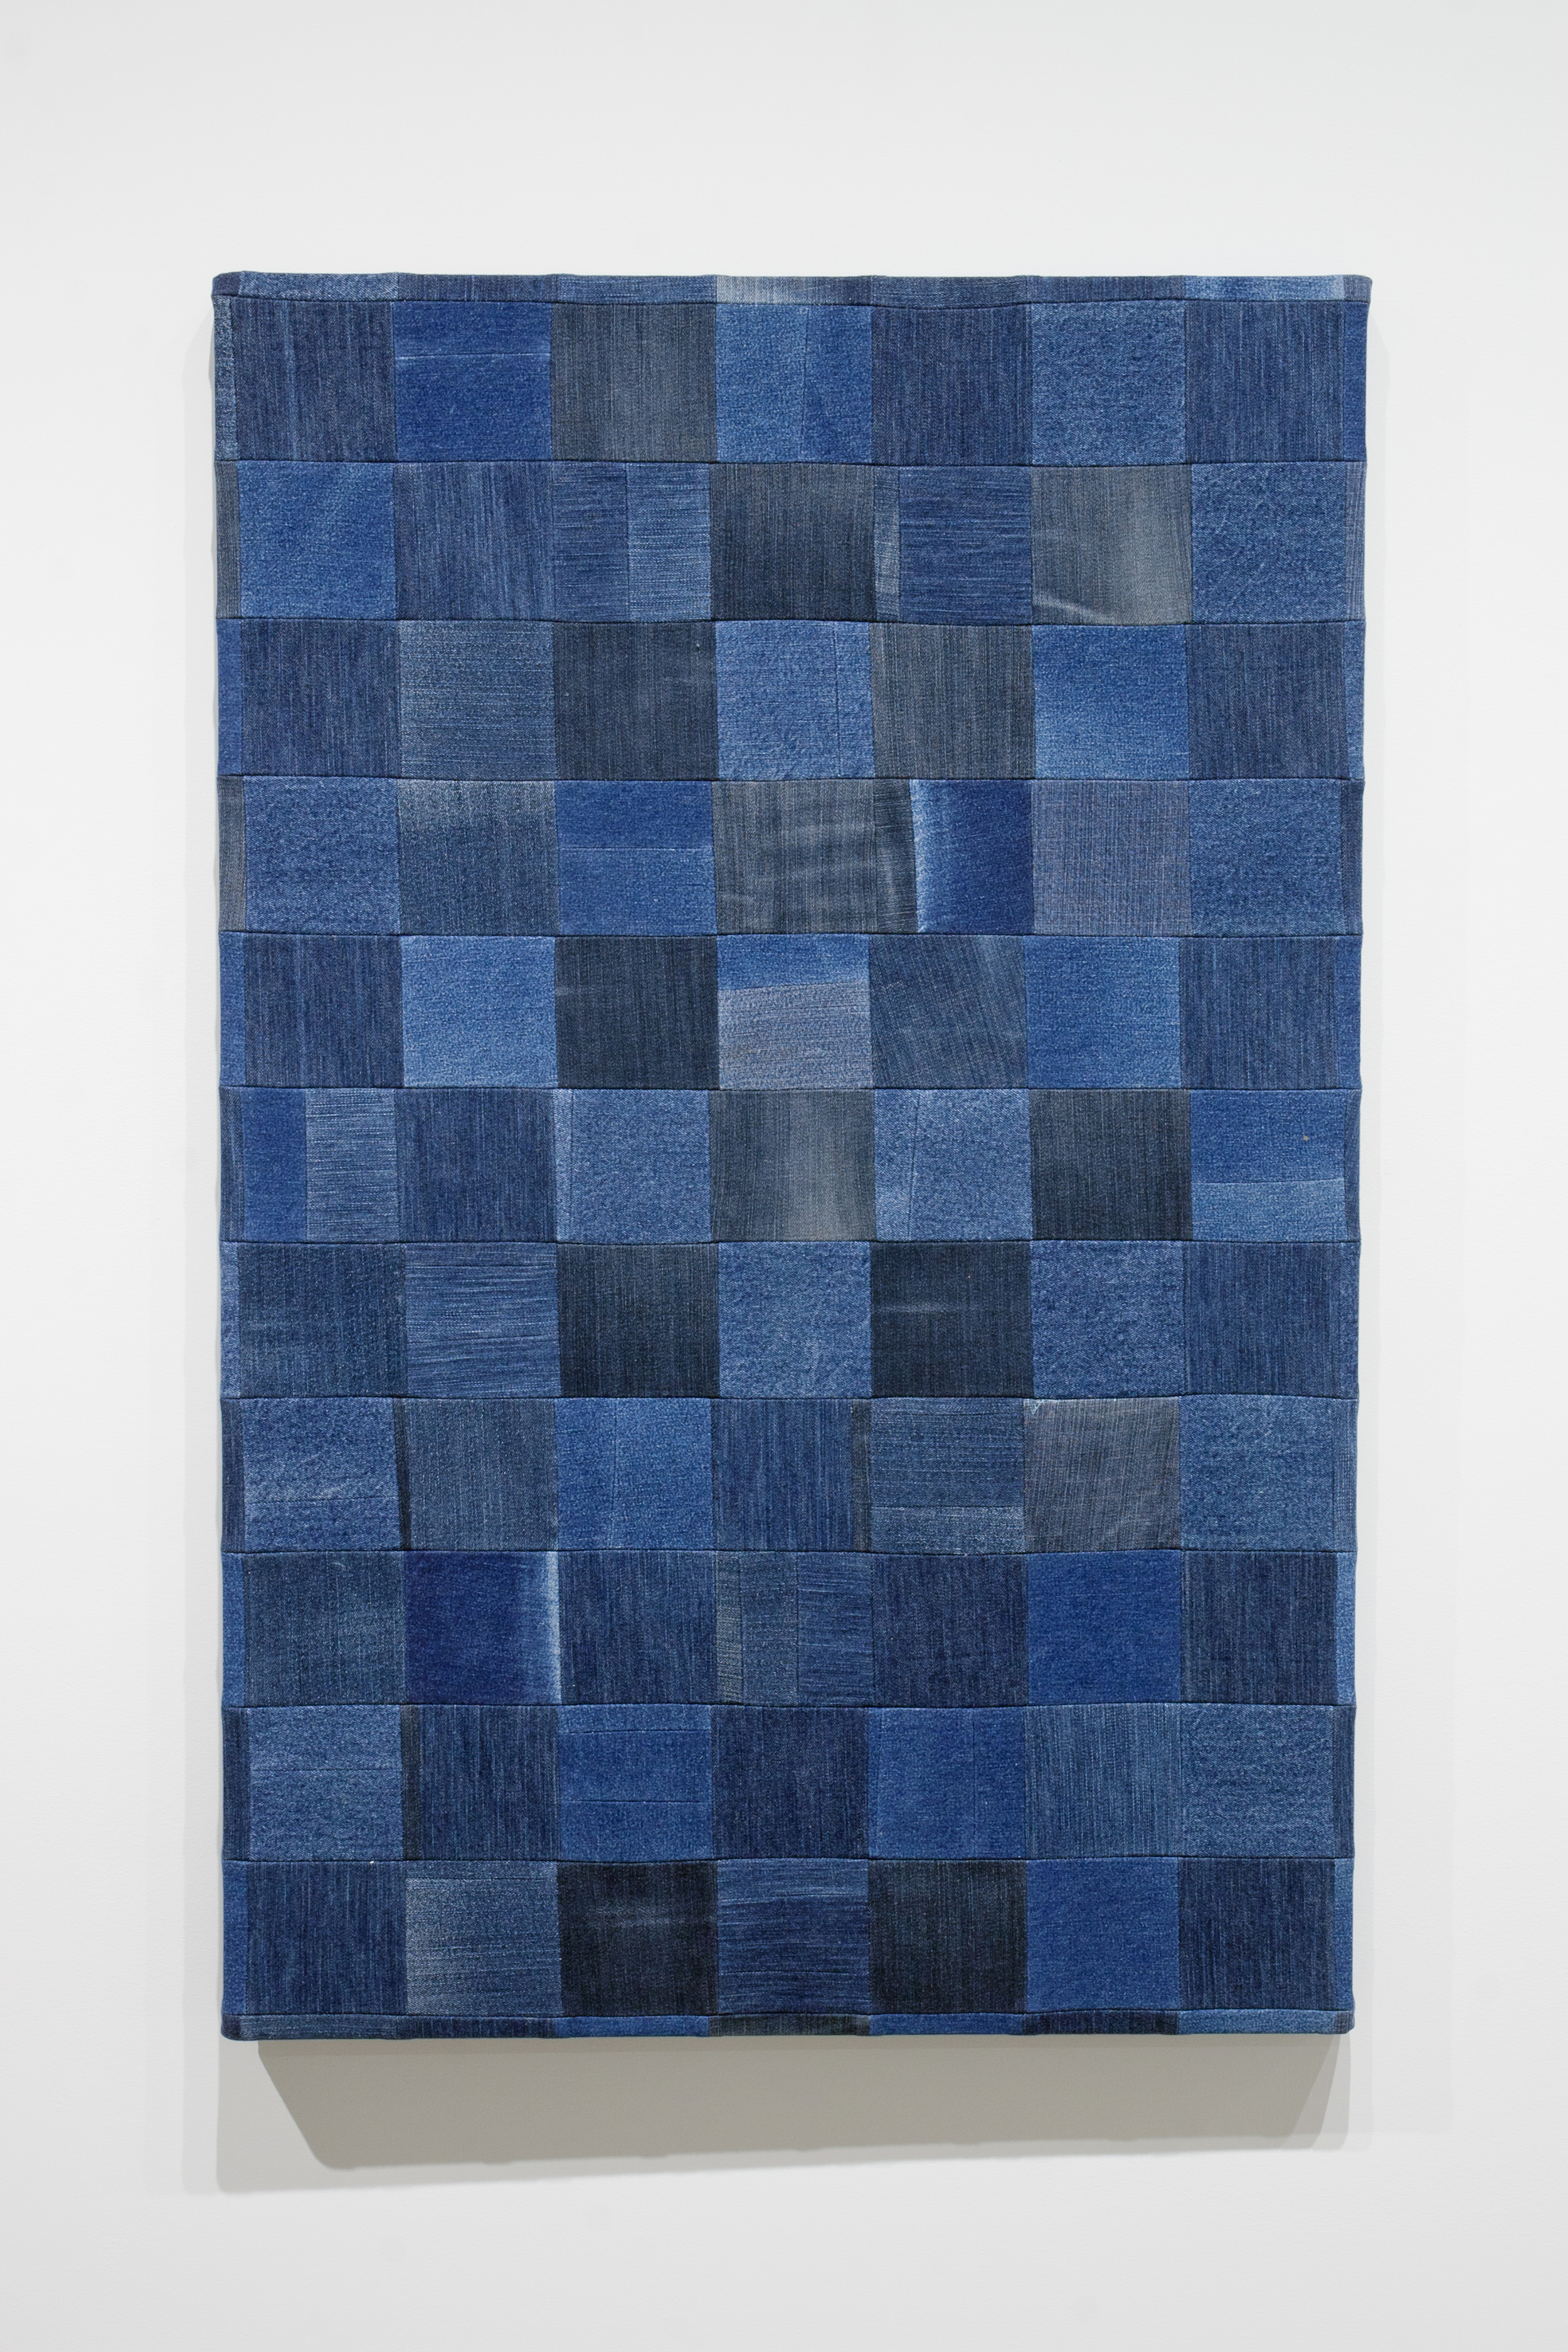 Jeans (Dark) , 2015,mixed fabrics,88 x 75 cm (34.5 x 29.5 in)